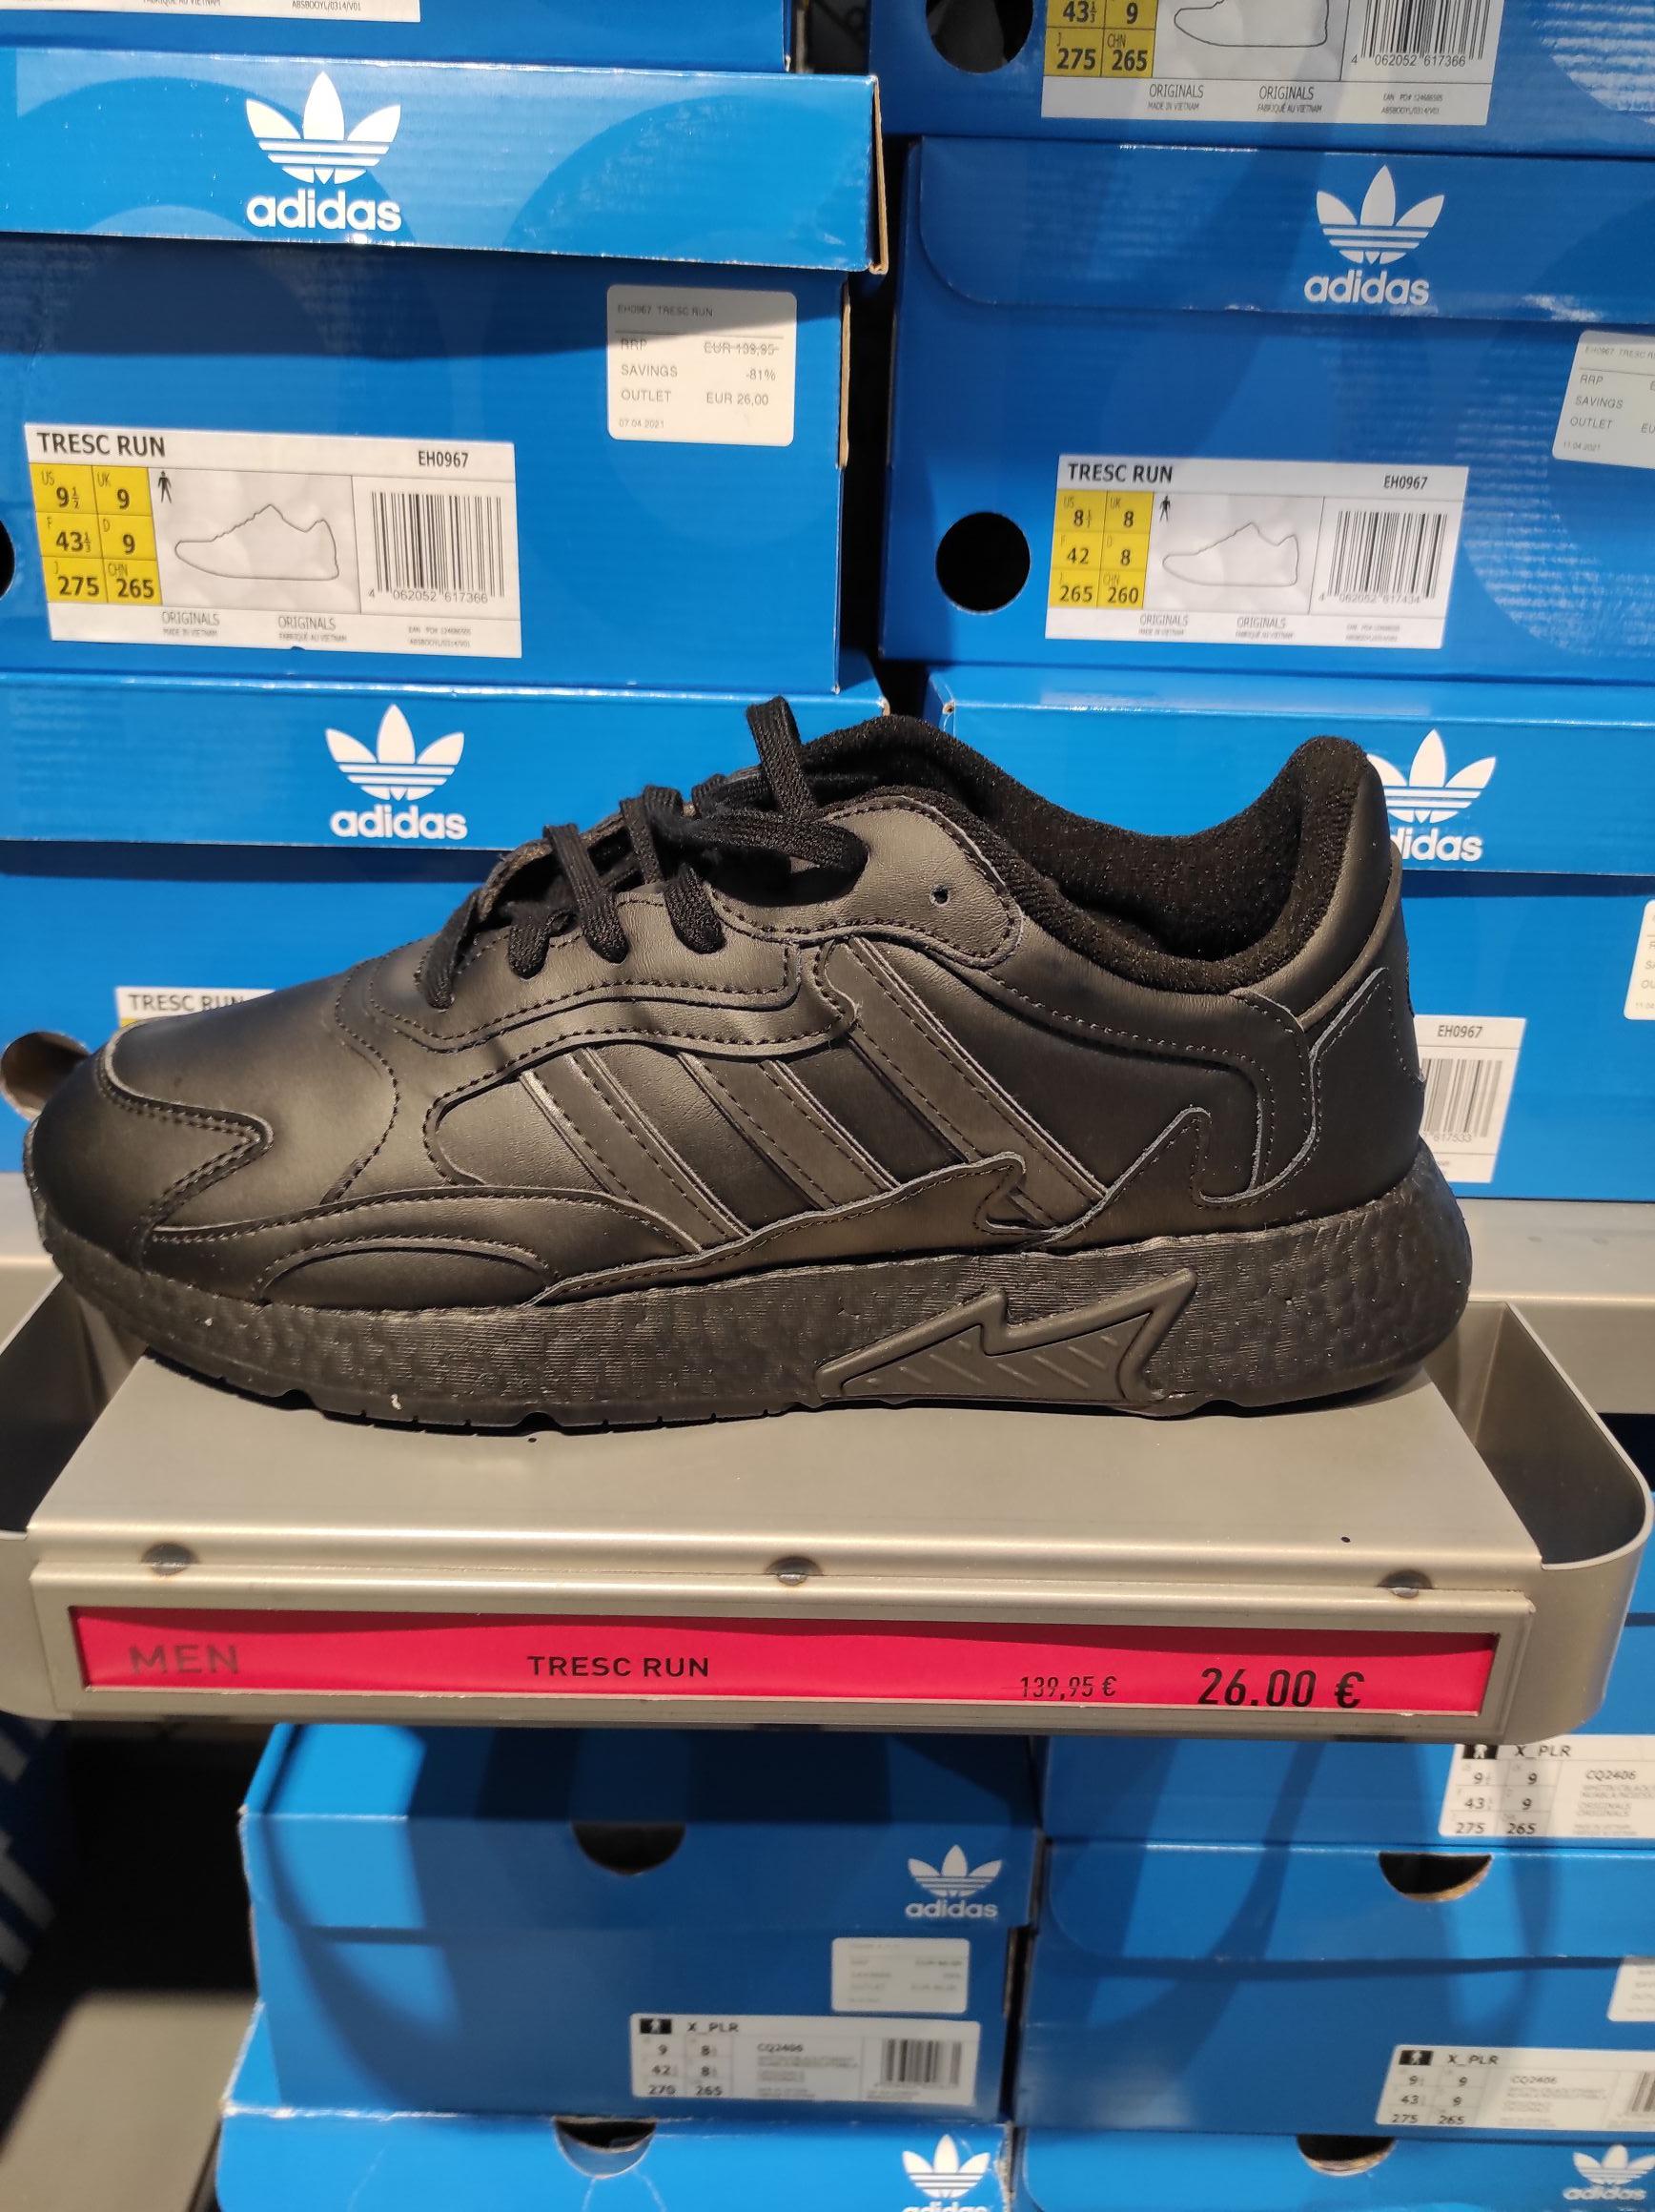 Adidas Tresc Run (Tienda Adidas - Nassica -Getafe)